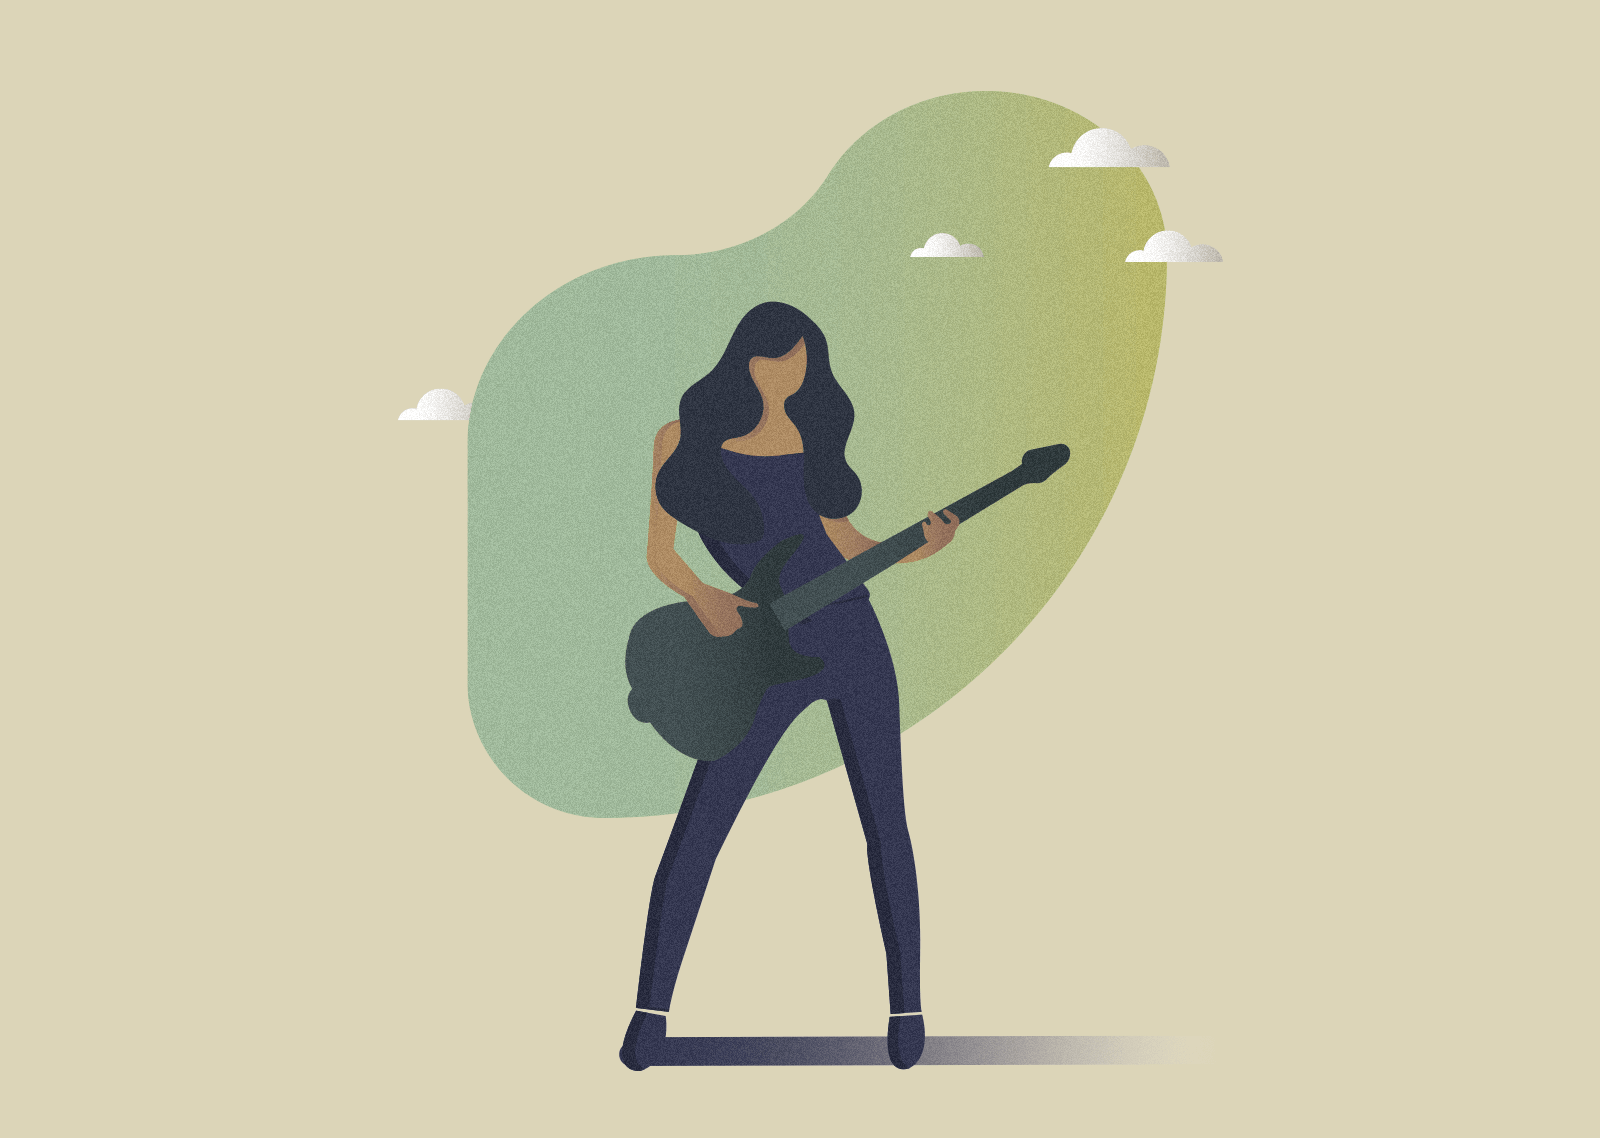 Guitar_girl_1600x1200